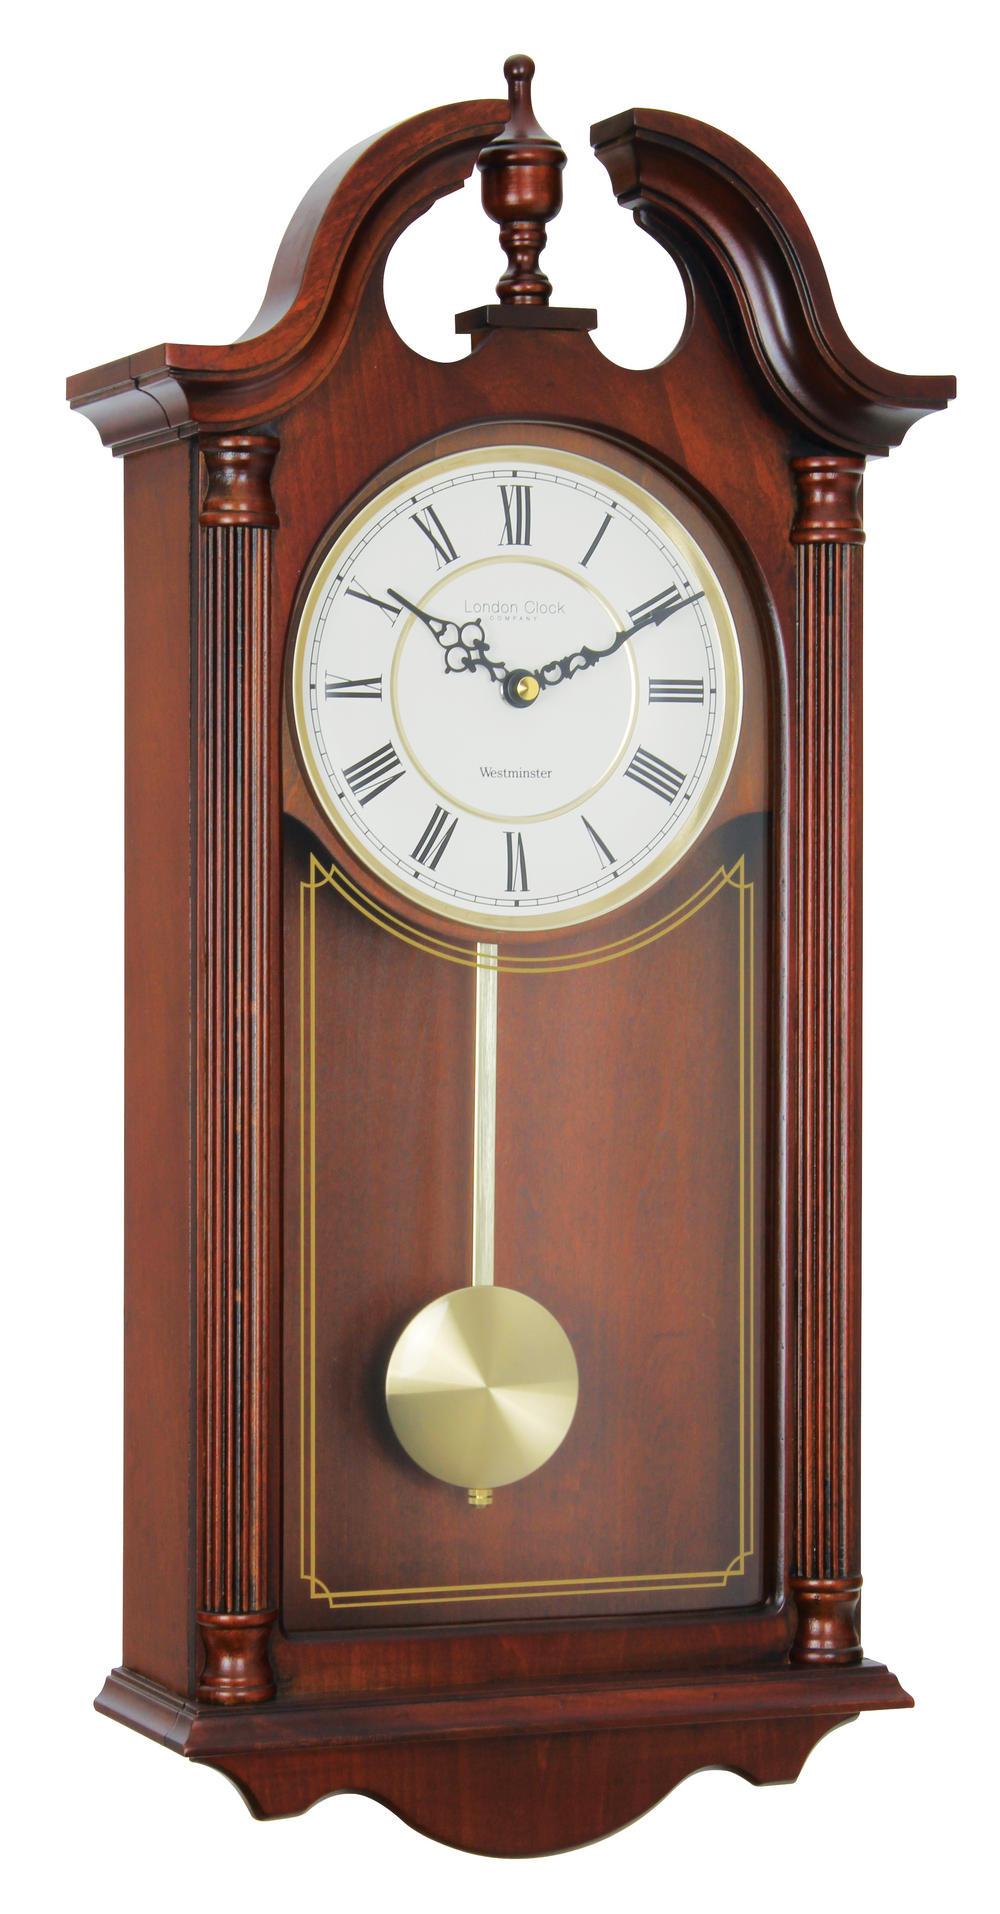 London Clock Company Mahogany Finish Westminster Chime Pendulum Wall Clock